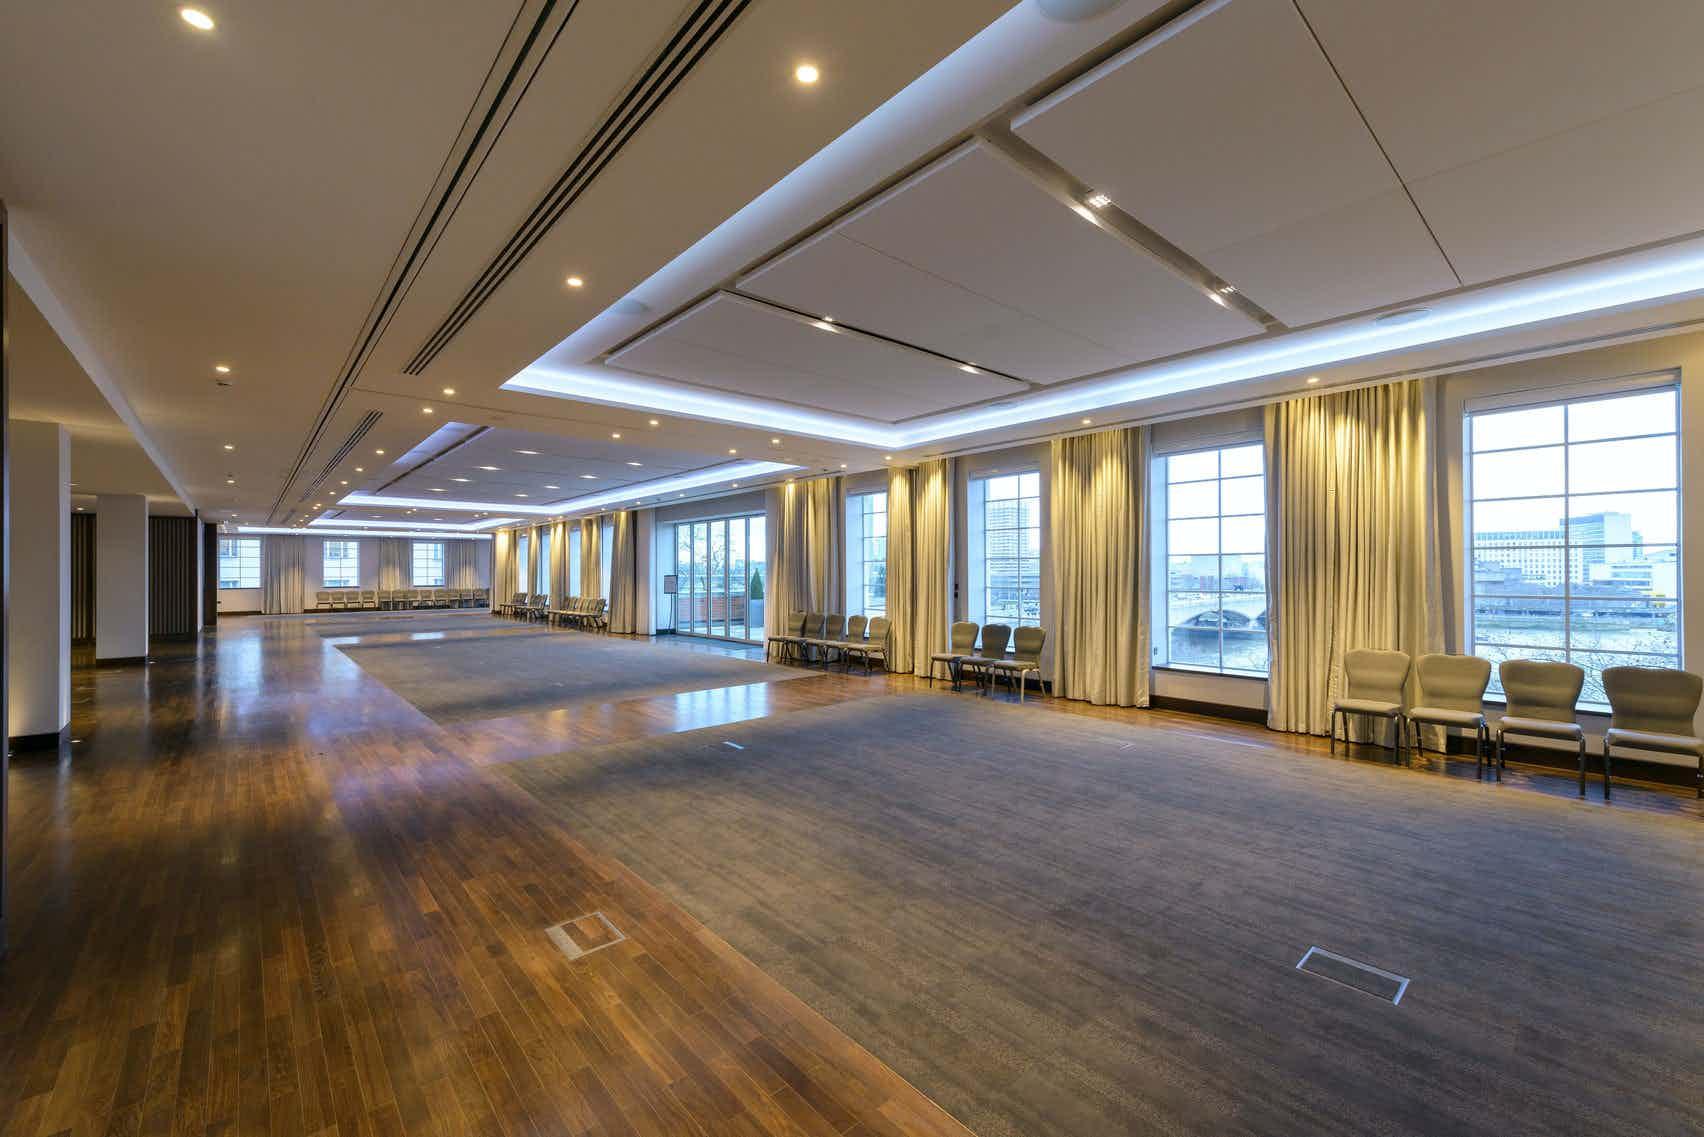 Riverside Room, IET London: Savoy Place